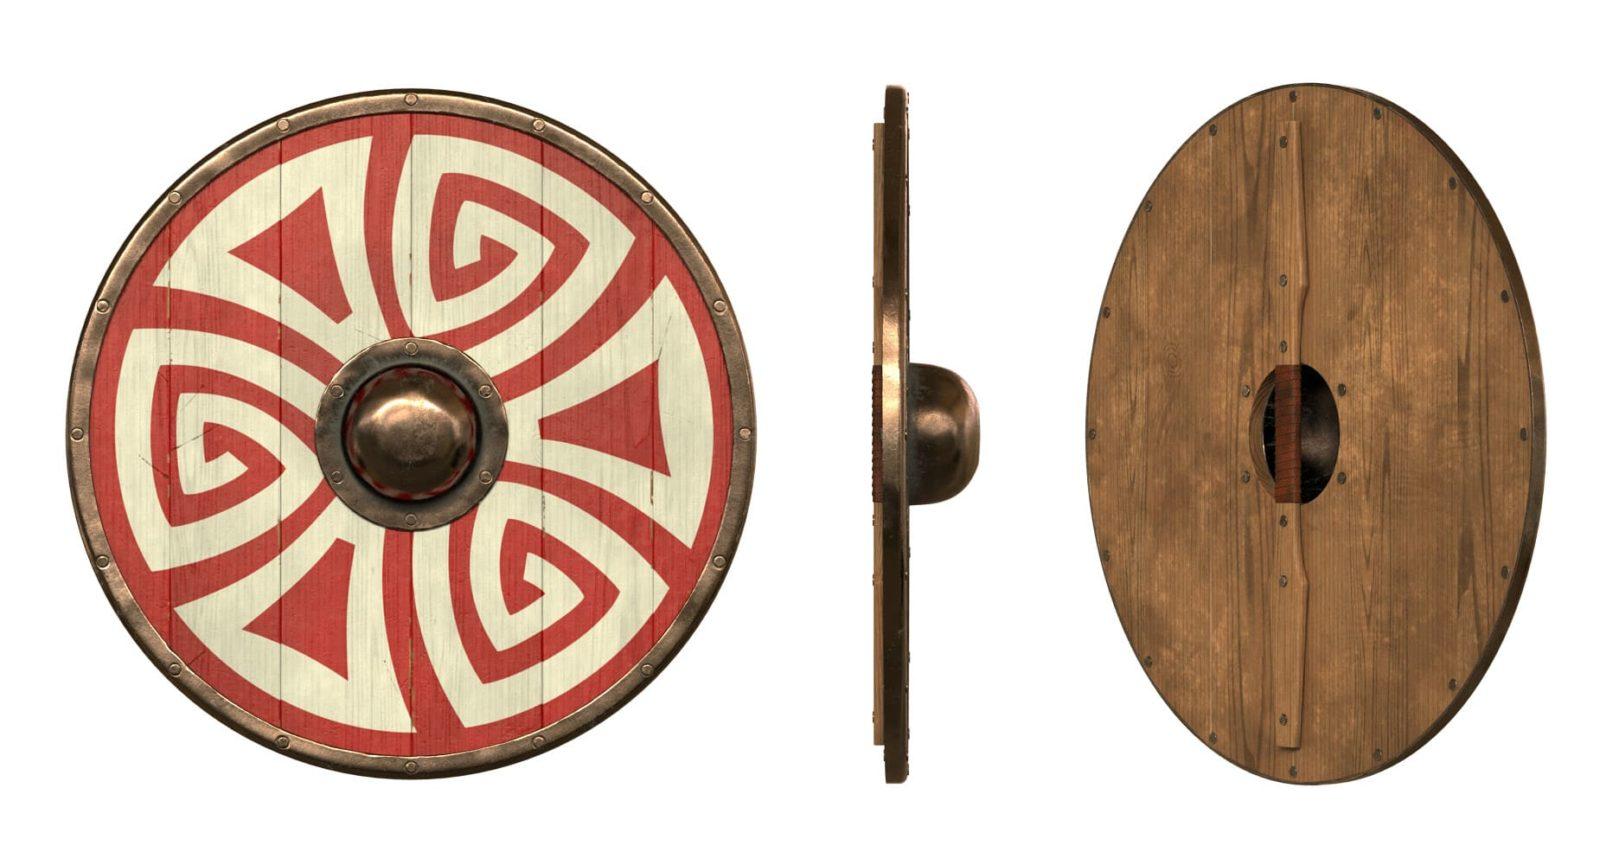 Щит викинга в средние века